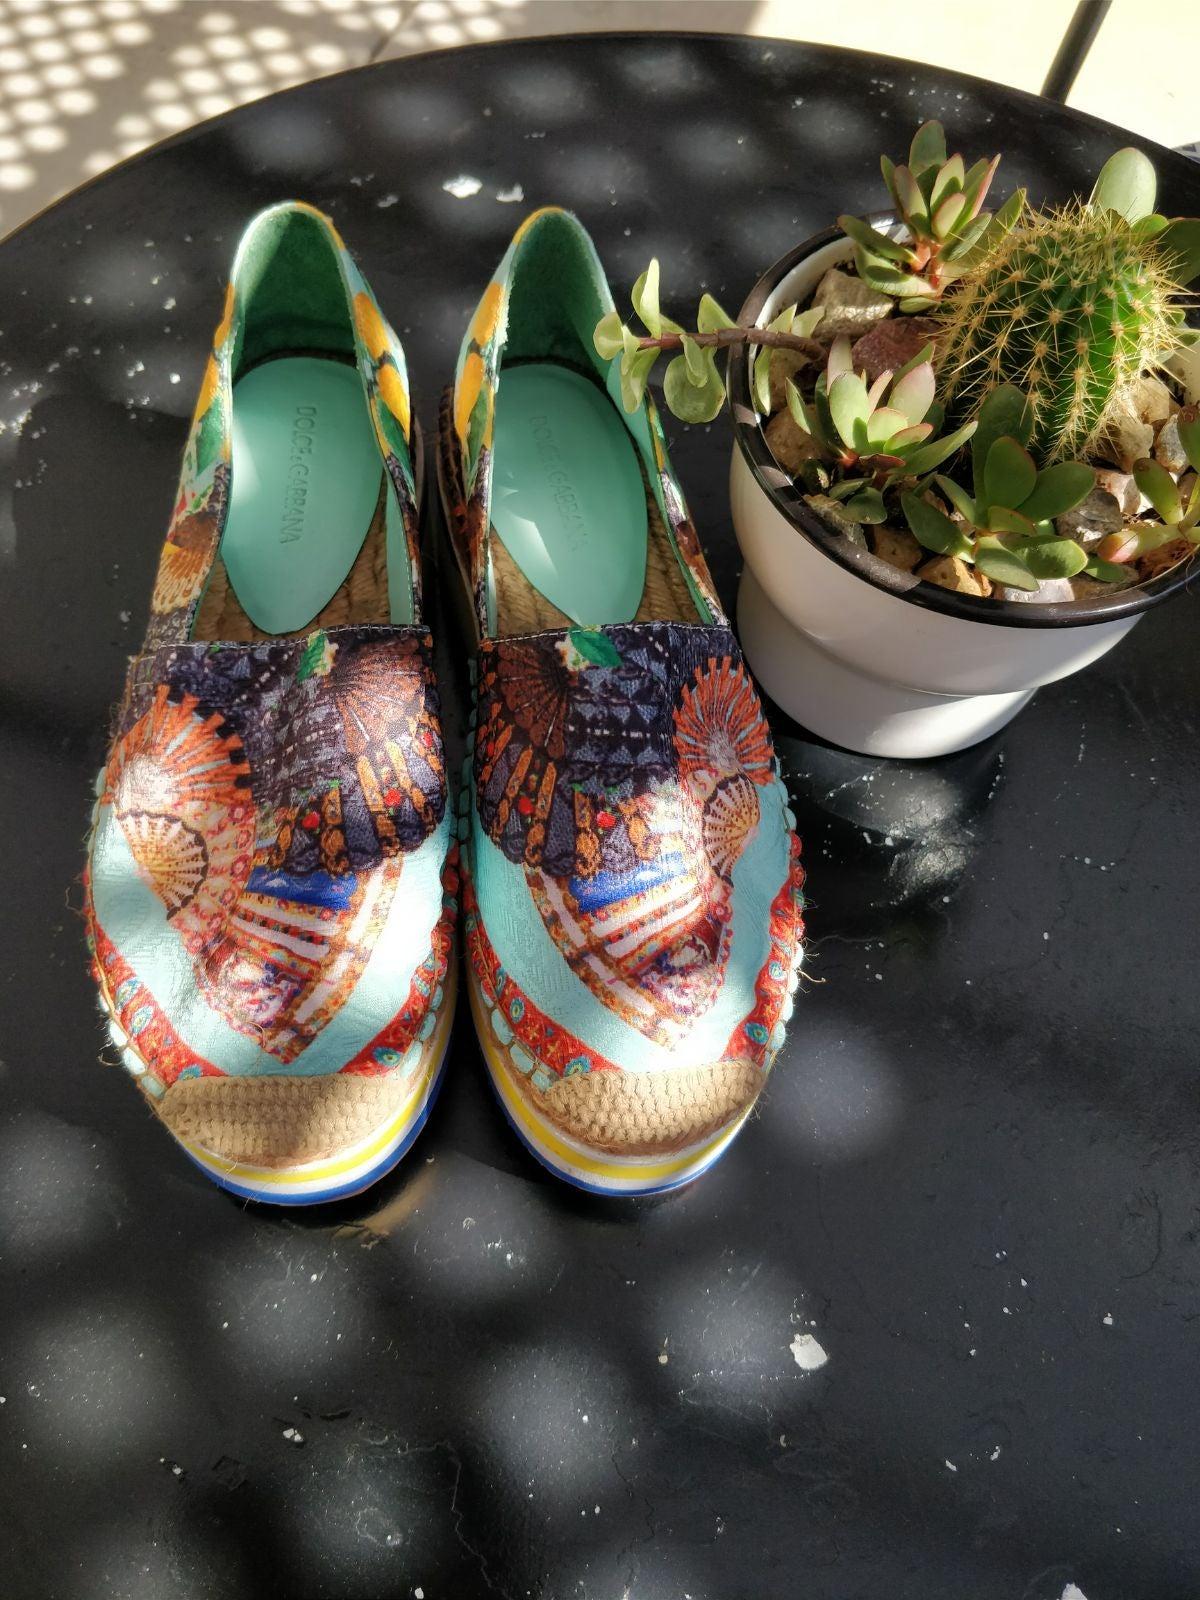 Dolce and Gabbana platform shoes